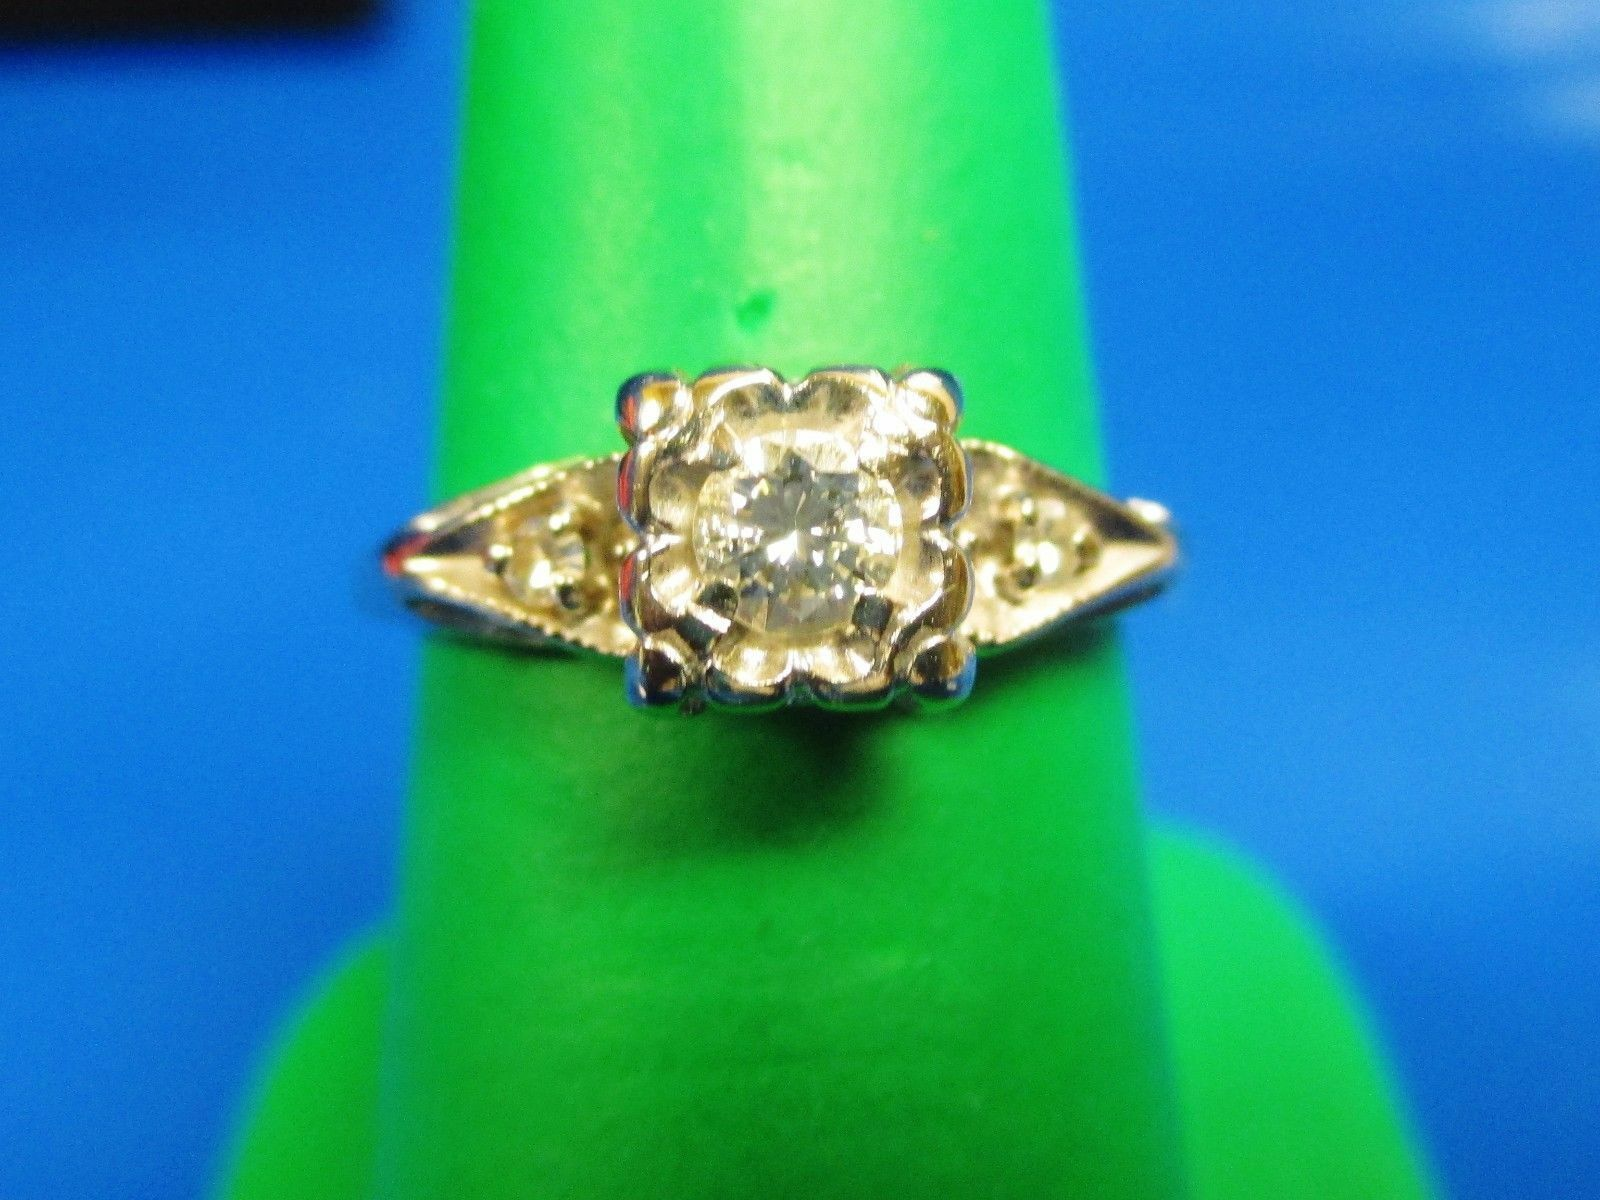 GORGEOUS VINTAGE 14K gold 3 ROUND DIAMOND ENGAGEMENT Ring 0.23 tcw sIze 6.5